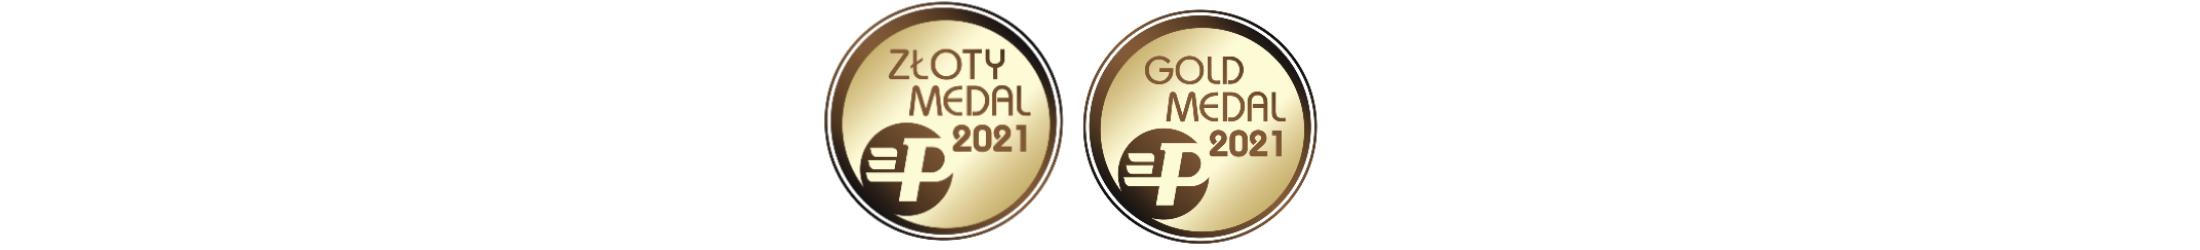 Złoty Medal ITM 2021